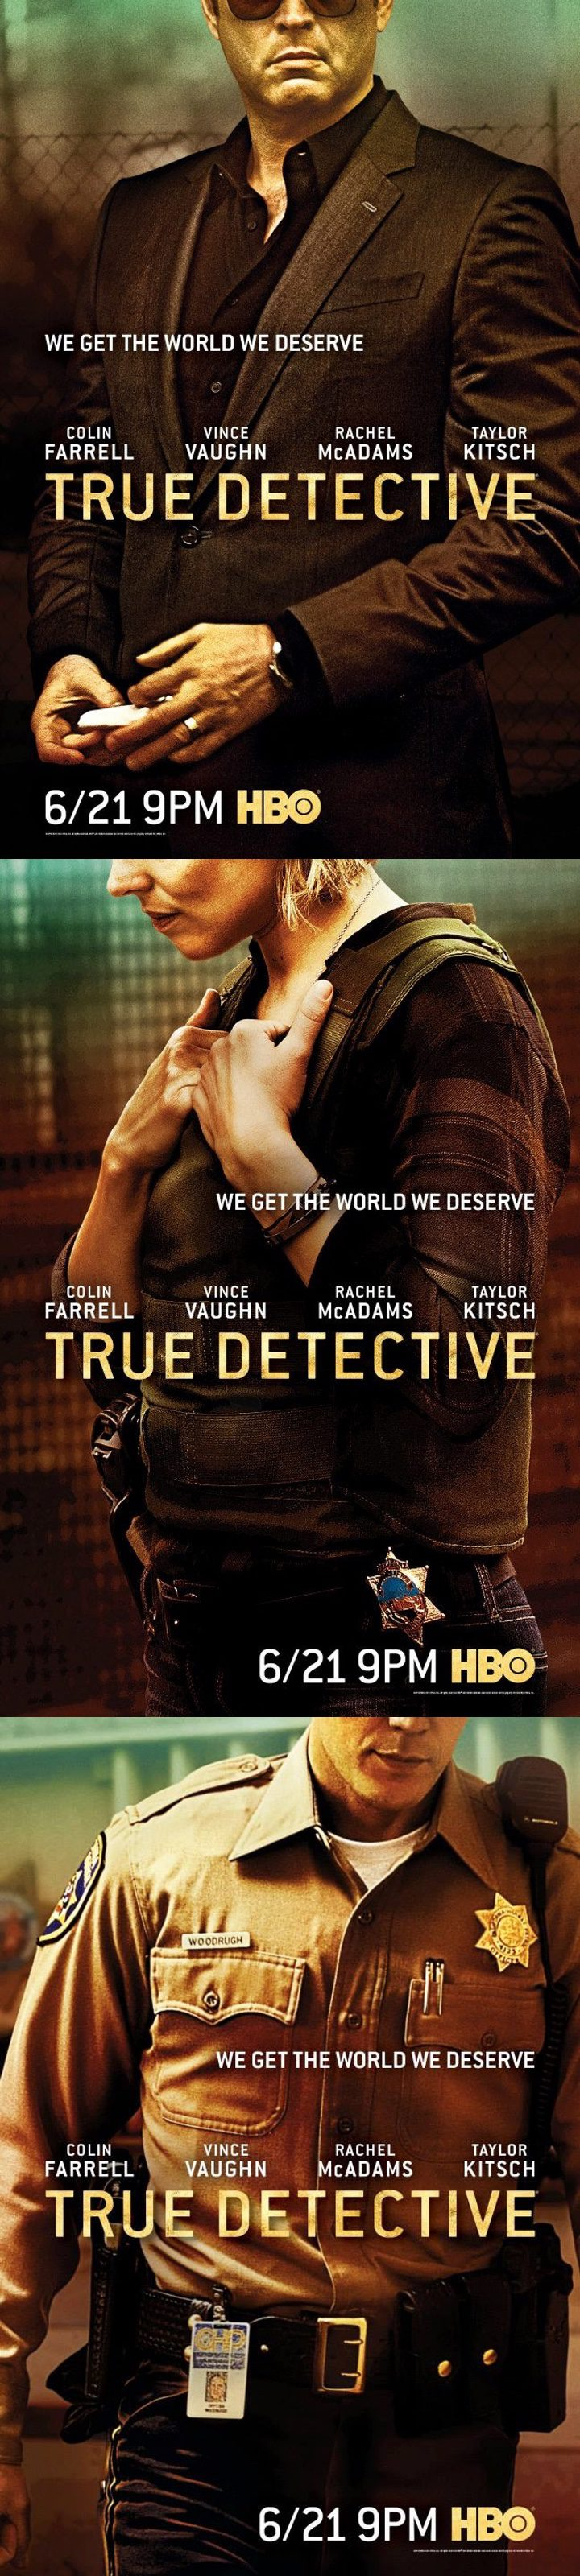 Pósters 'True Detective'